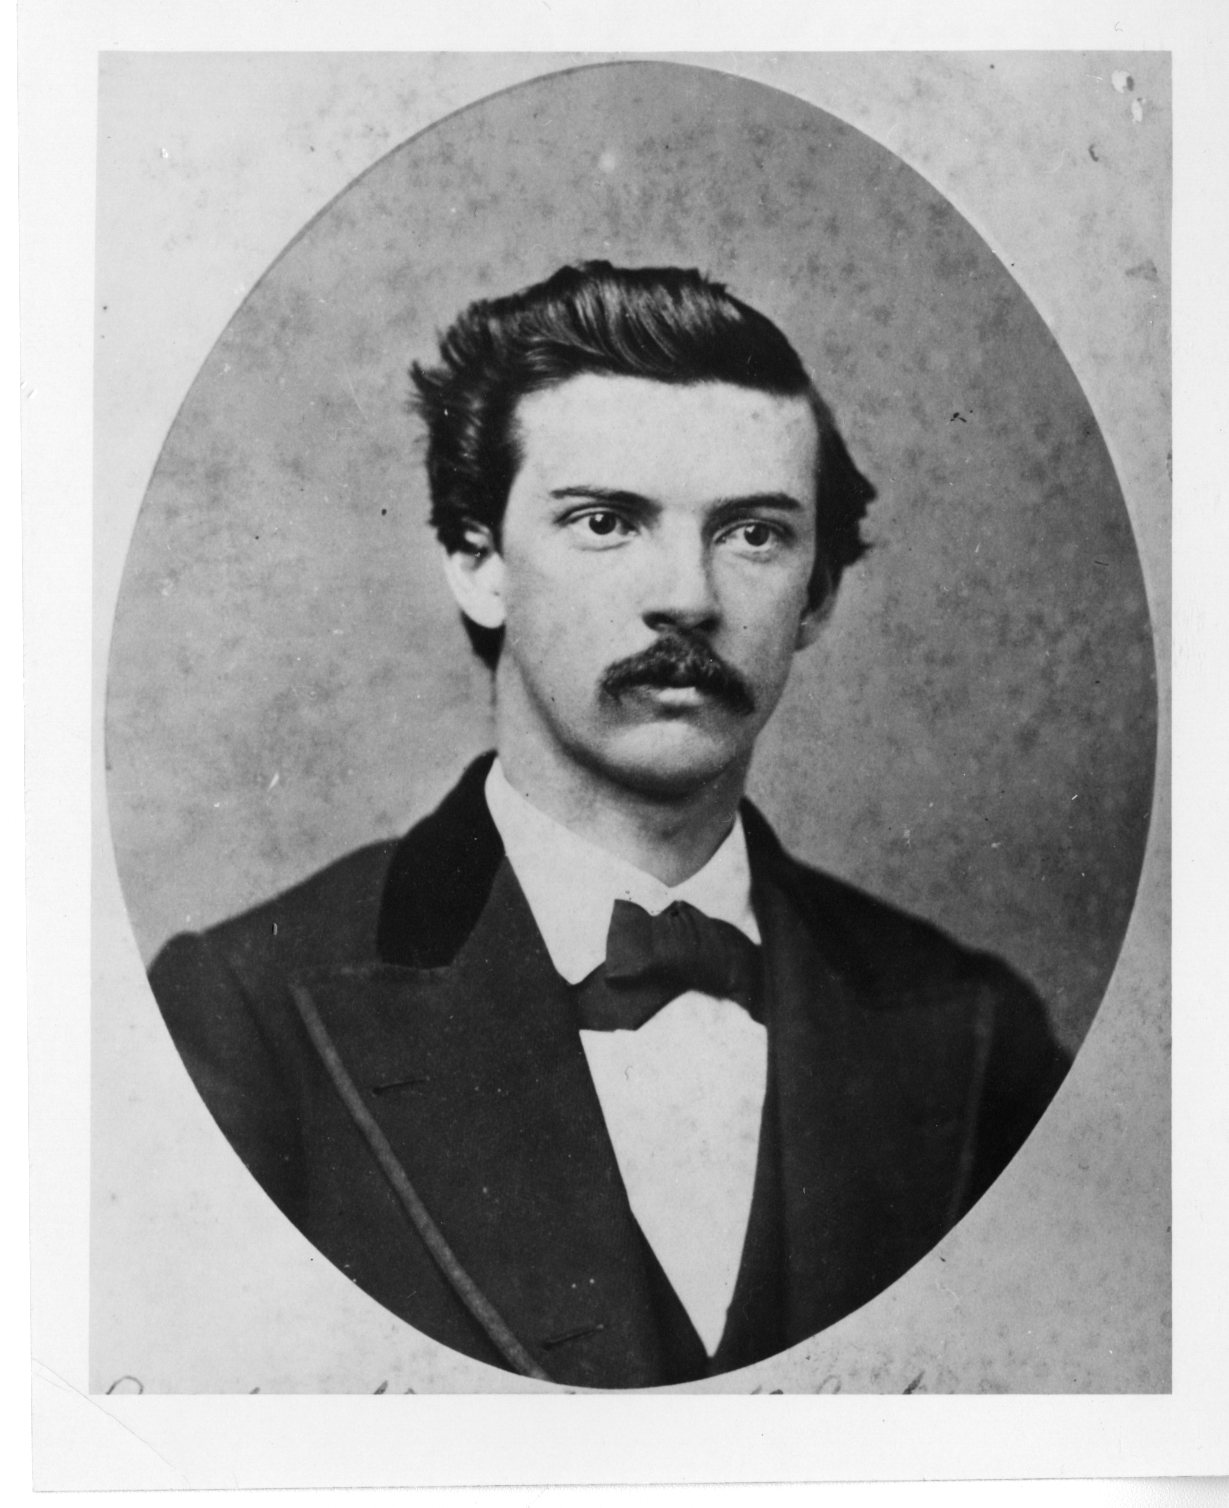 Photo of Alfred James Morrison taken in 1876.